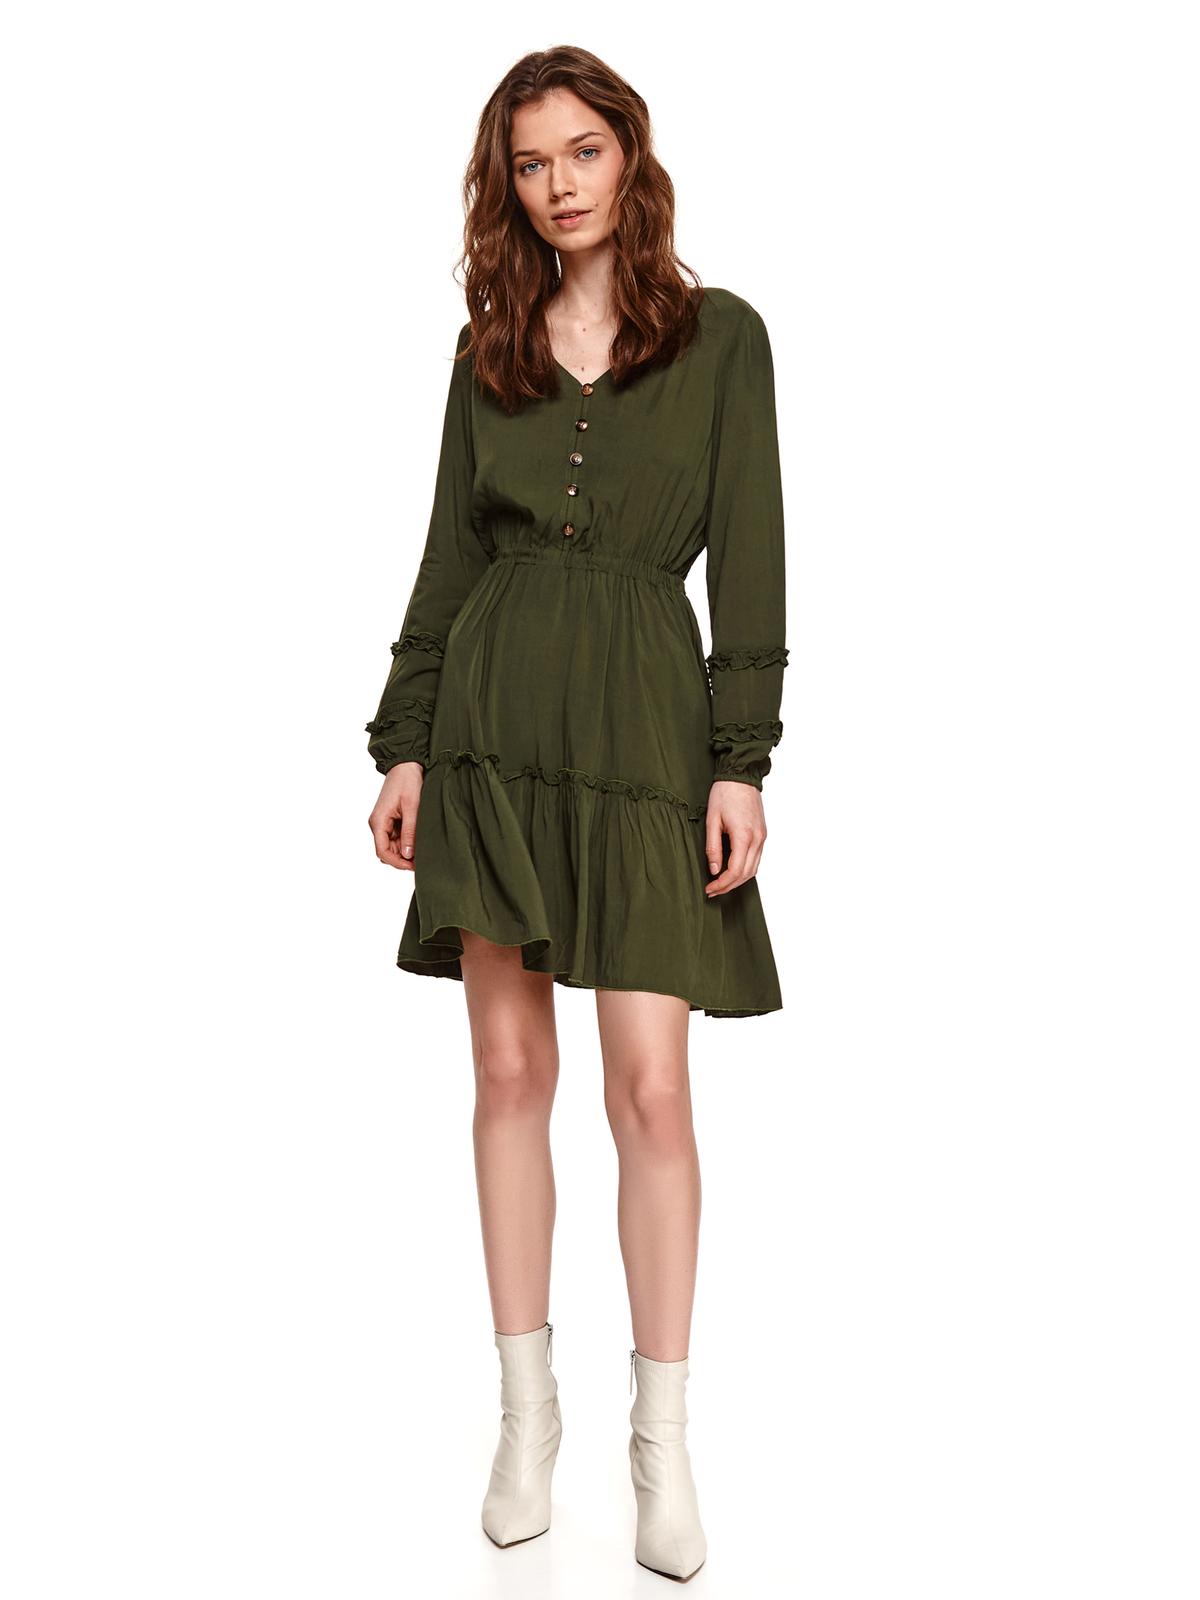 Cloche with elastic waist with ruffle details short cut darkgreen dress